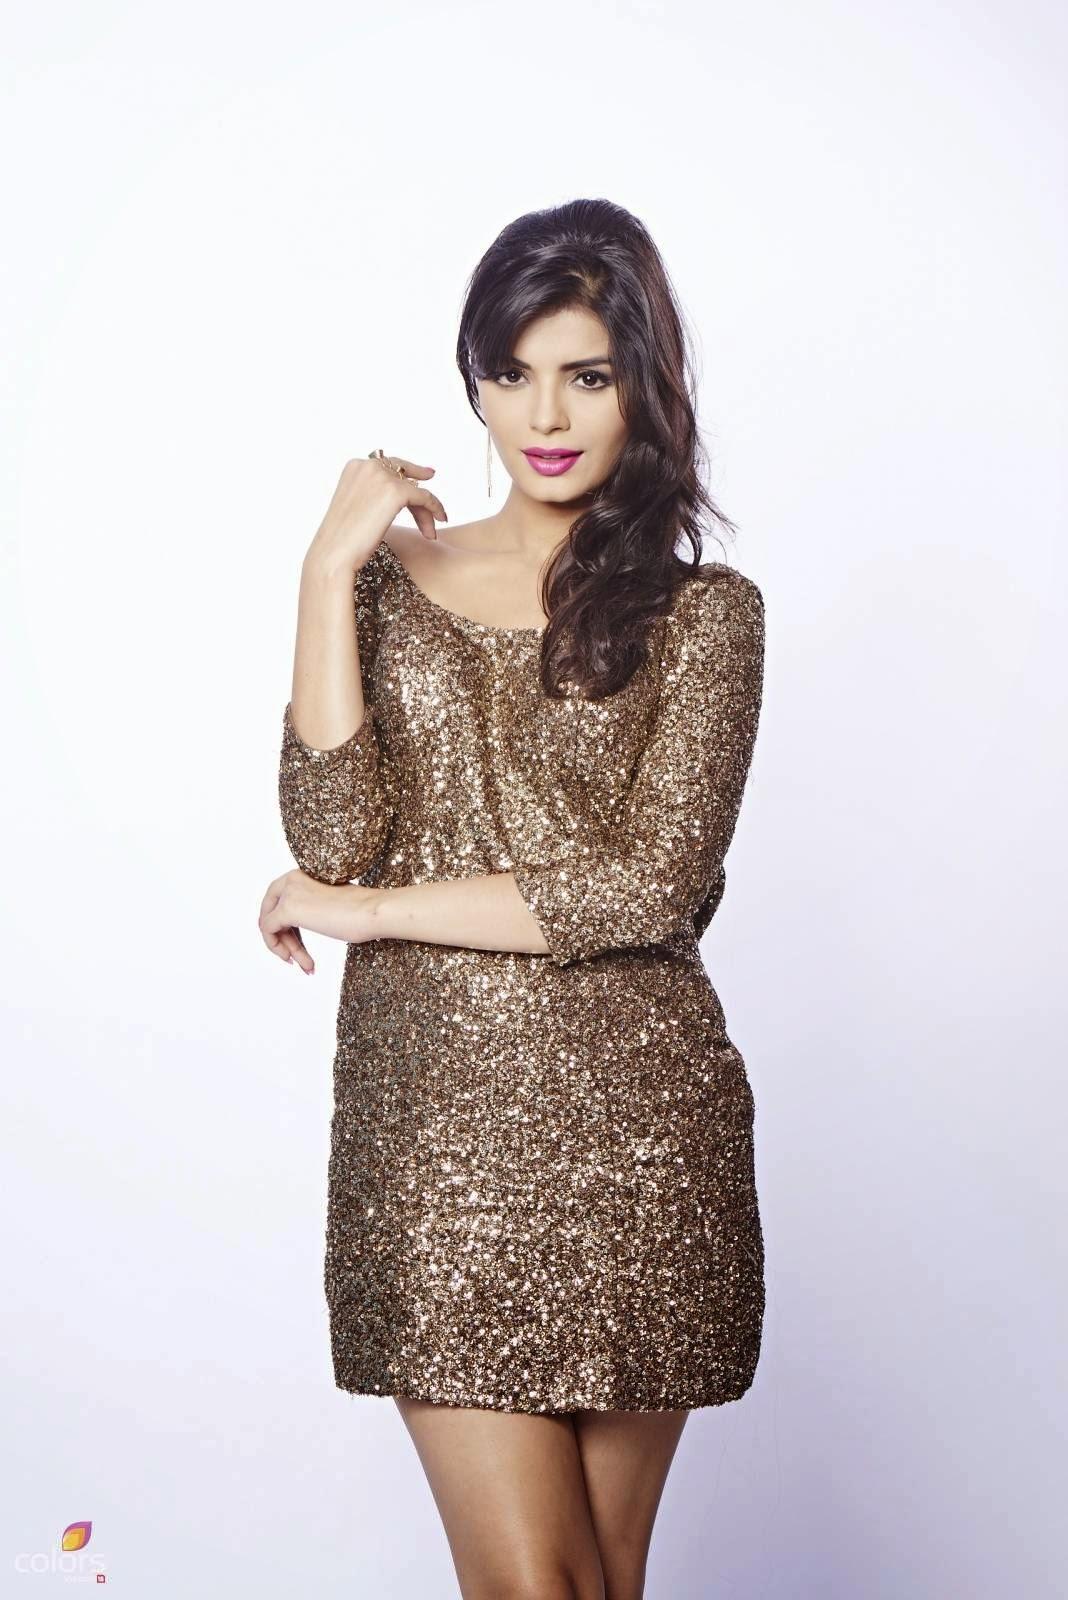 Sonali Raut, Bigg Boss 8 Contestants Pics, Wiki & Biography